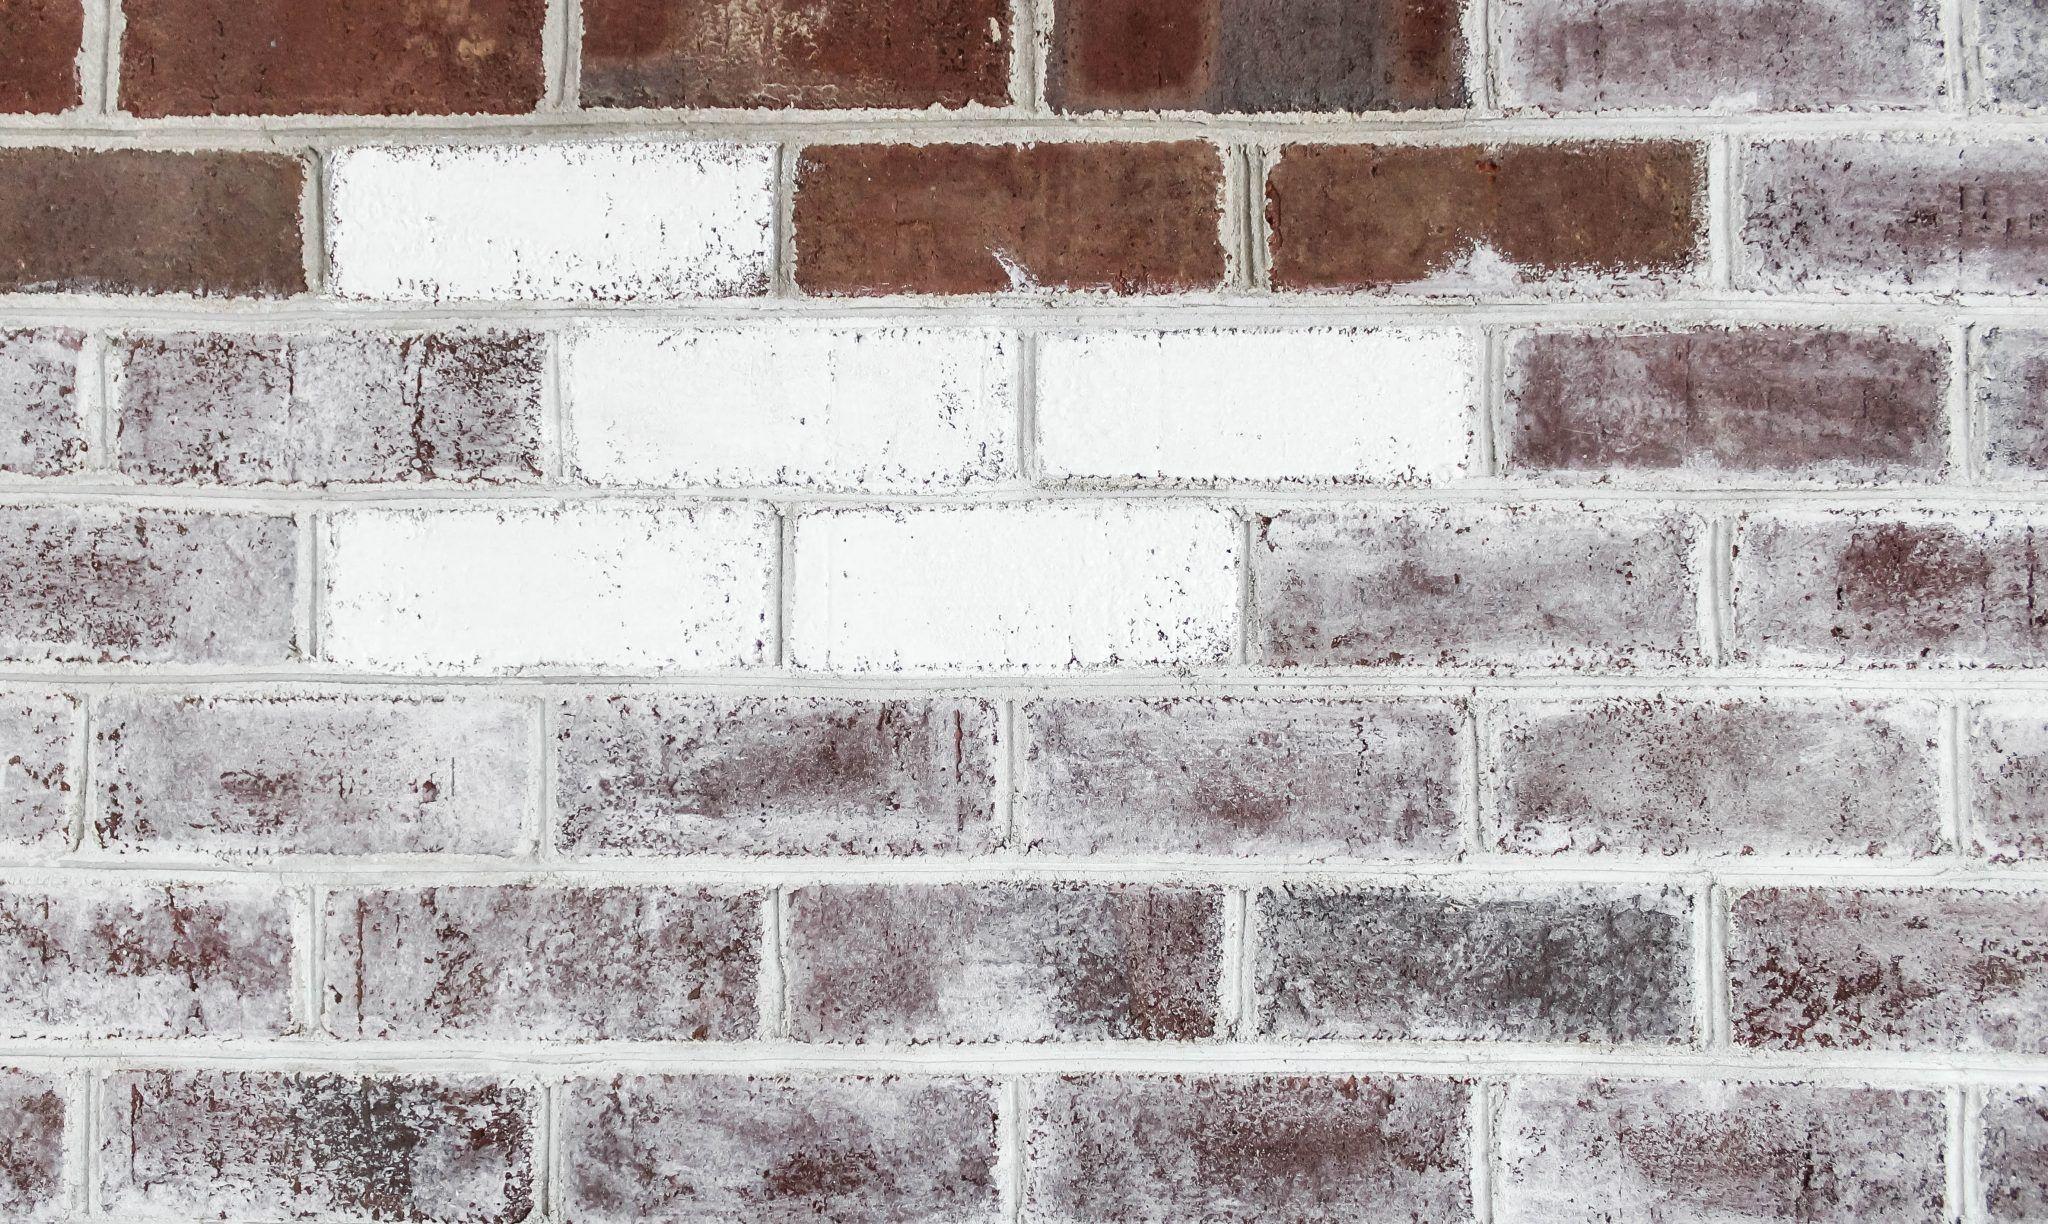 Painting Brick Fireplace White | A Renovation Story #whitebrickfireplace Painting Brick Fireplace White | A Renovation Story #whitebrickfireplace Painting Brick Fireplace White | A Renovation Story #whitebrickfireplace Painting Brick Fireplace White | A Renovation Story #whitebrickfireplace